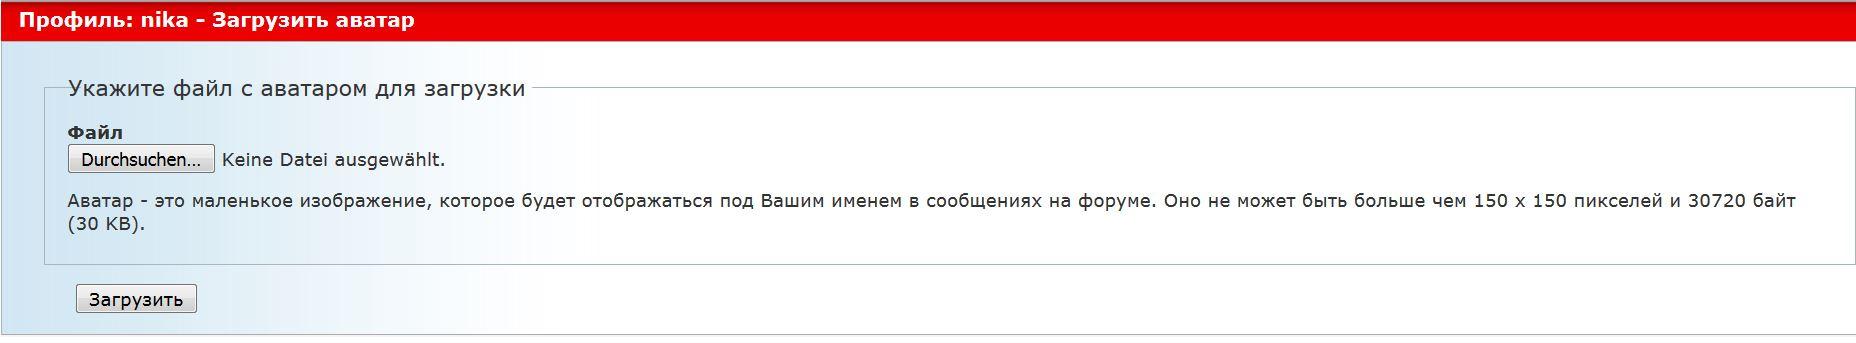 http://s0.uploads.ru/RdgbF.jpg